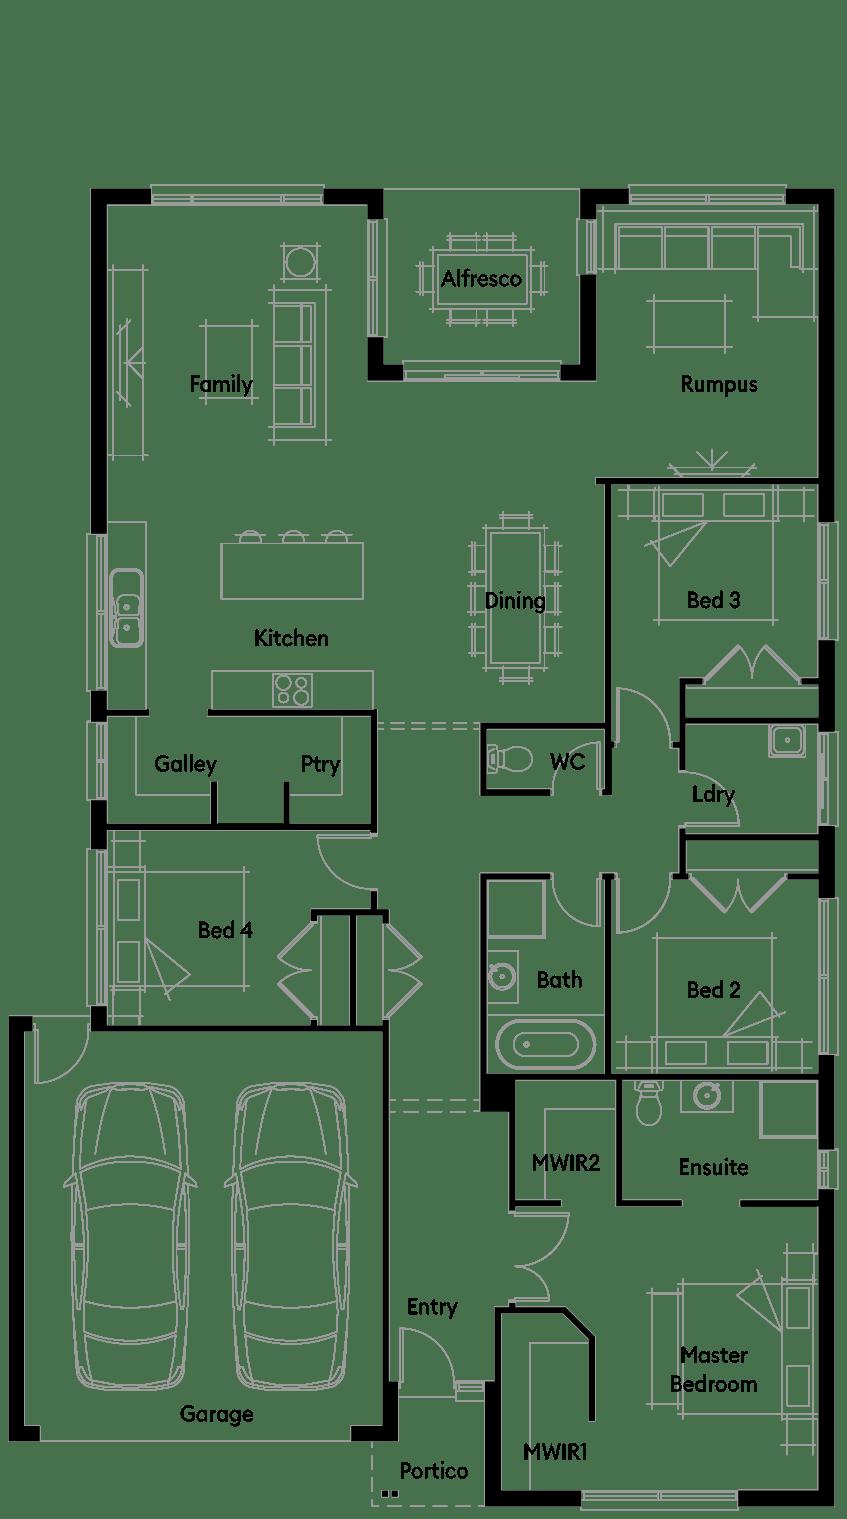 FloorPlan1_HOUSE761_Liverpool_25-18